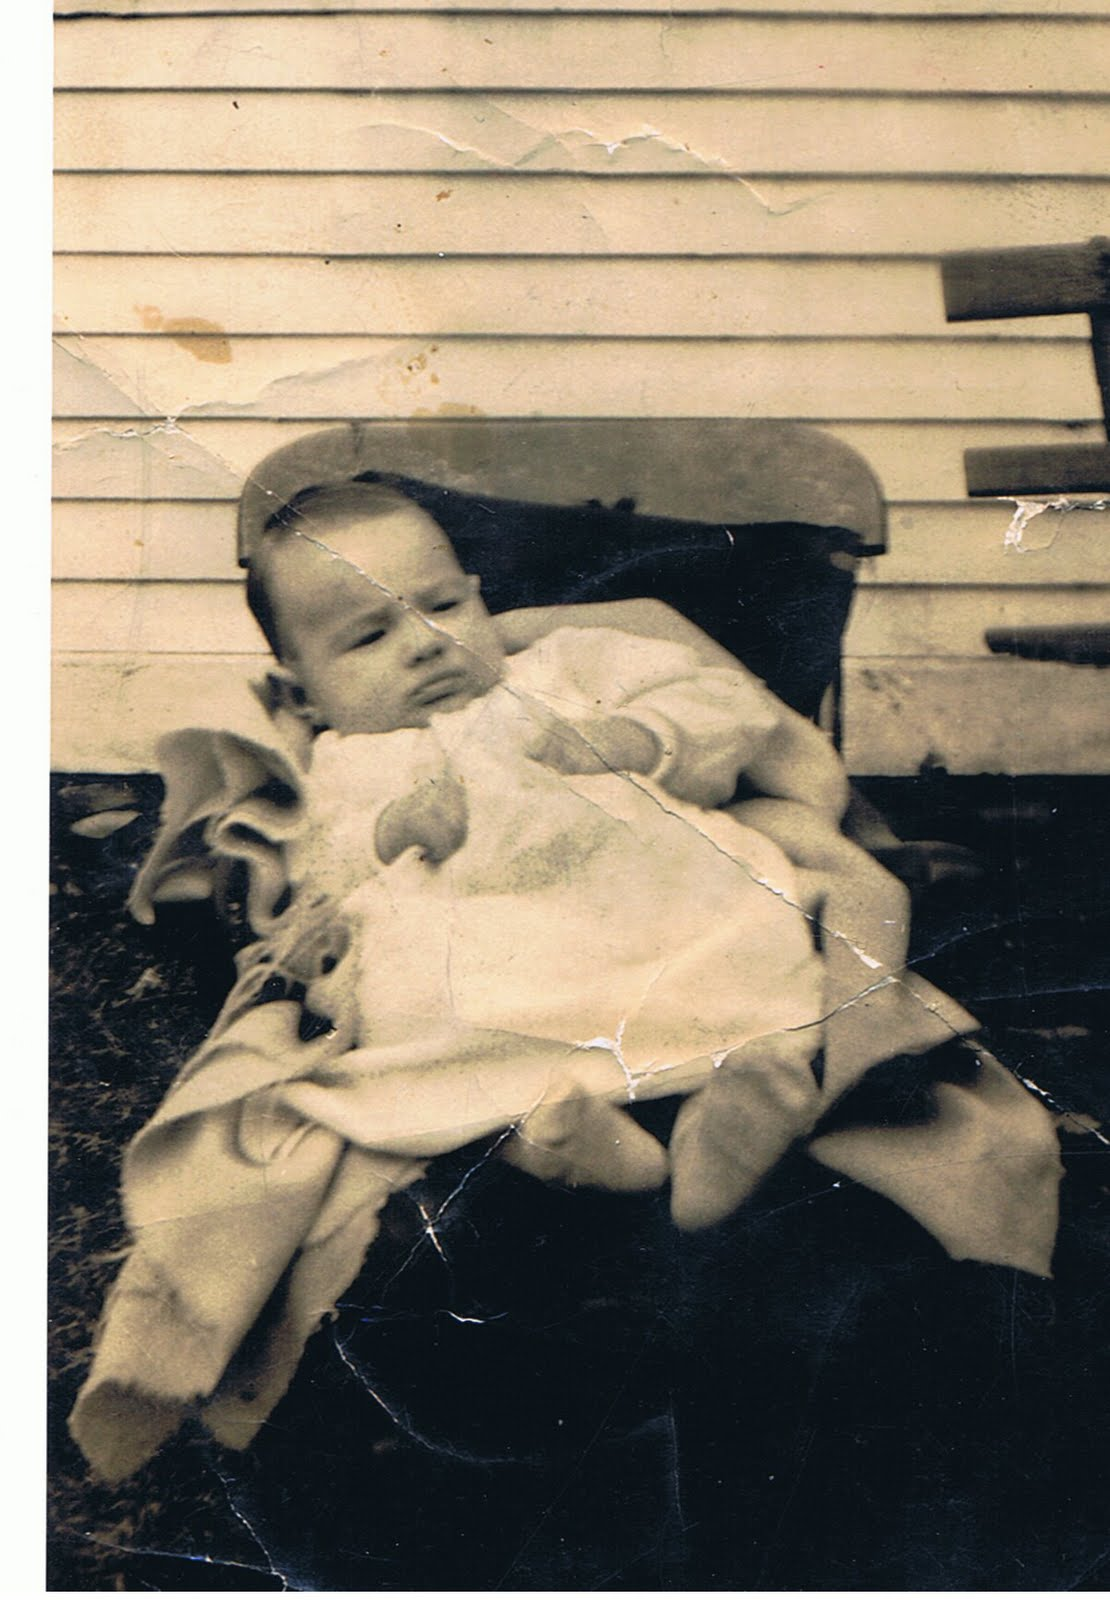 http://2.bp.blogspot.com/_rGUuTATVf0g/TI2C2FlOGCI/AAAAAAAAACU/e1XQUhMhgFk/s1600/William+Robert+Blades+baby+picture+1923.jpg